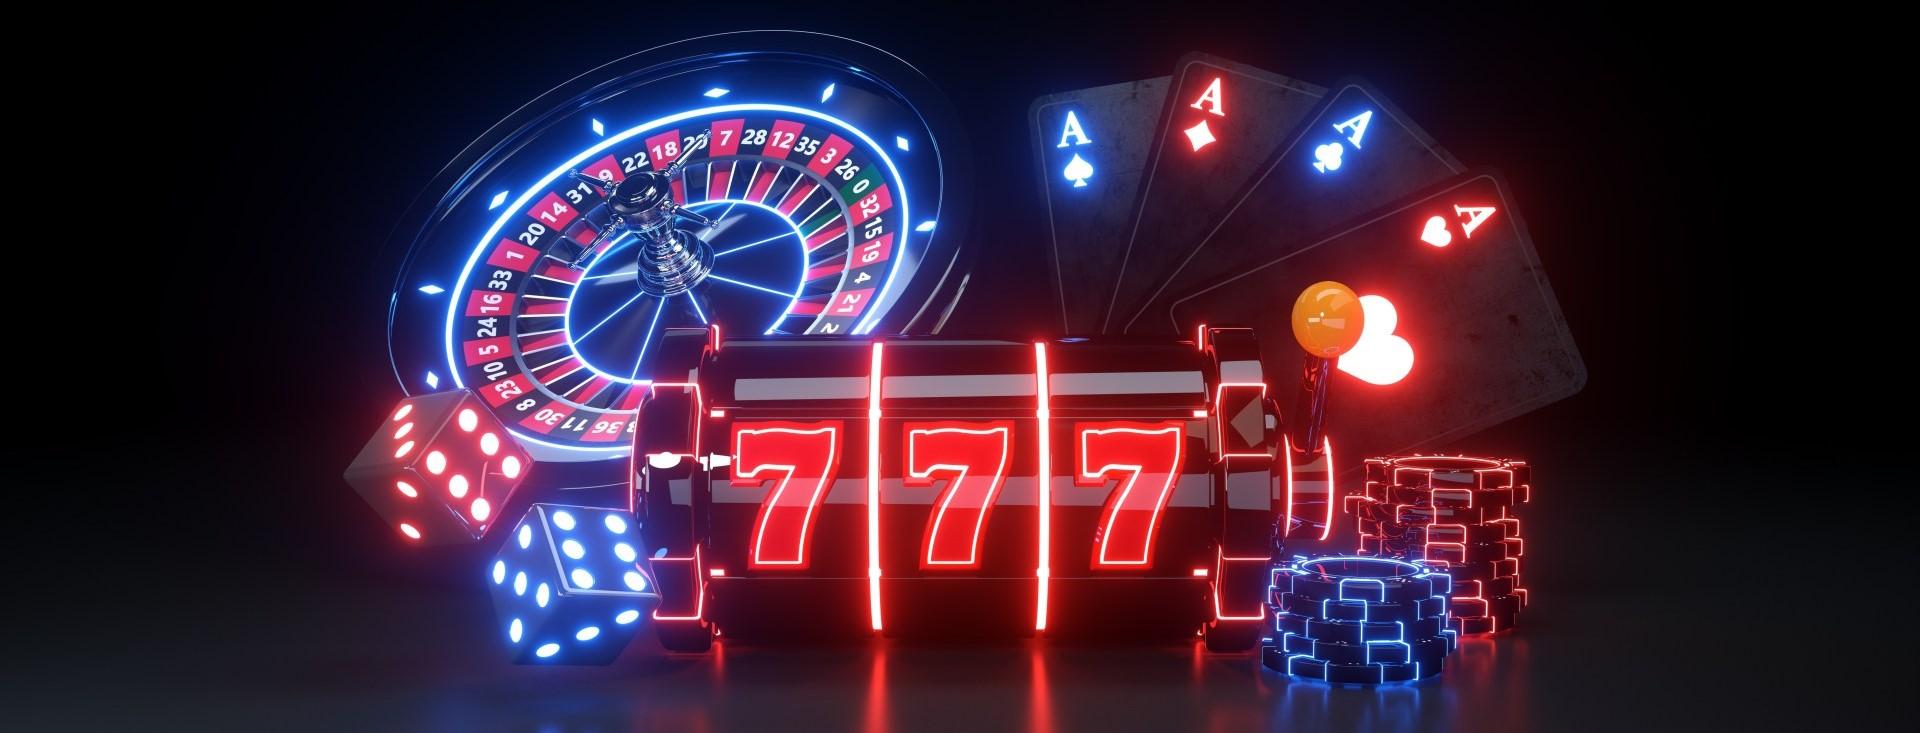 Canadian online casinos offering No Deposit Bonus